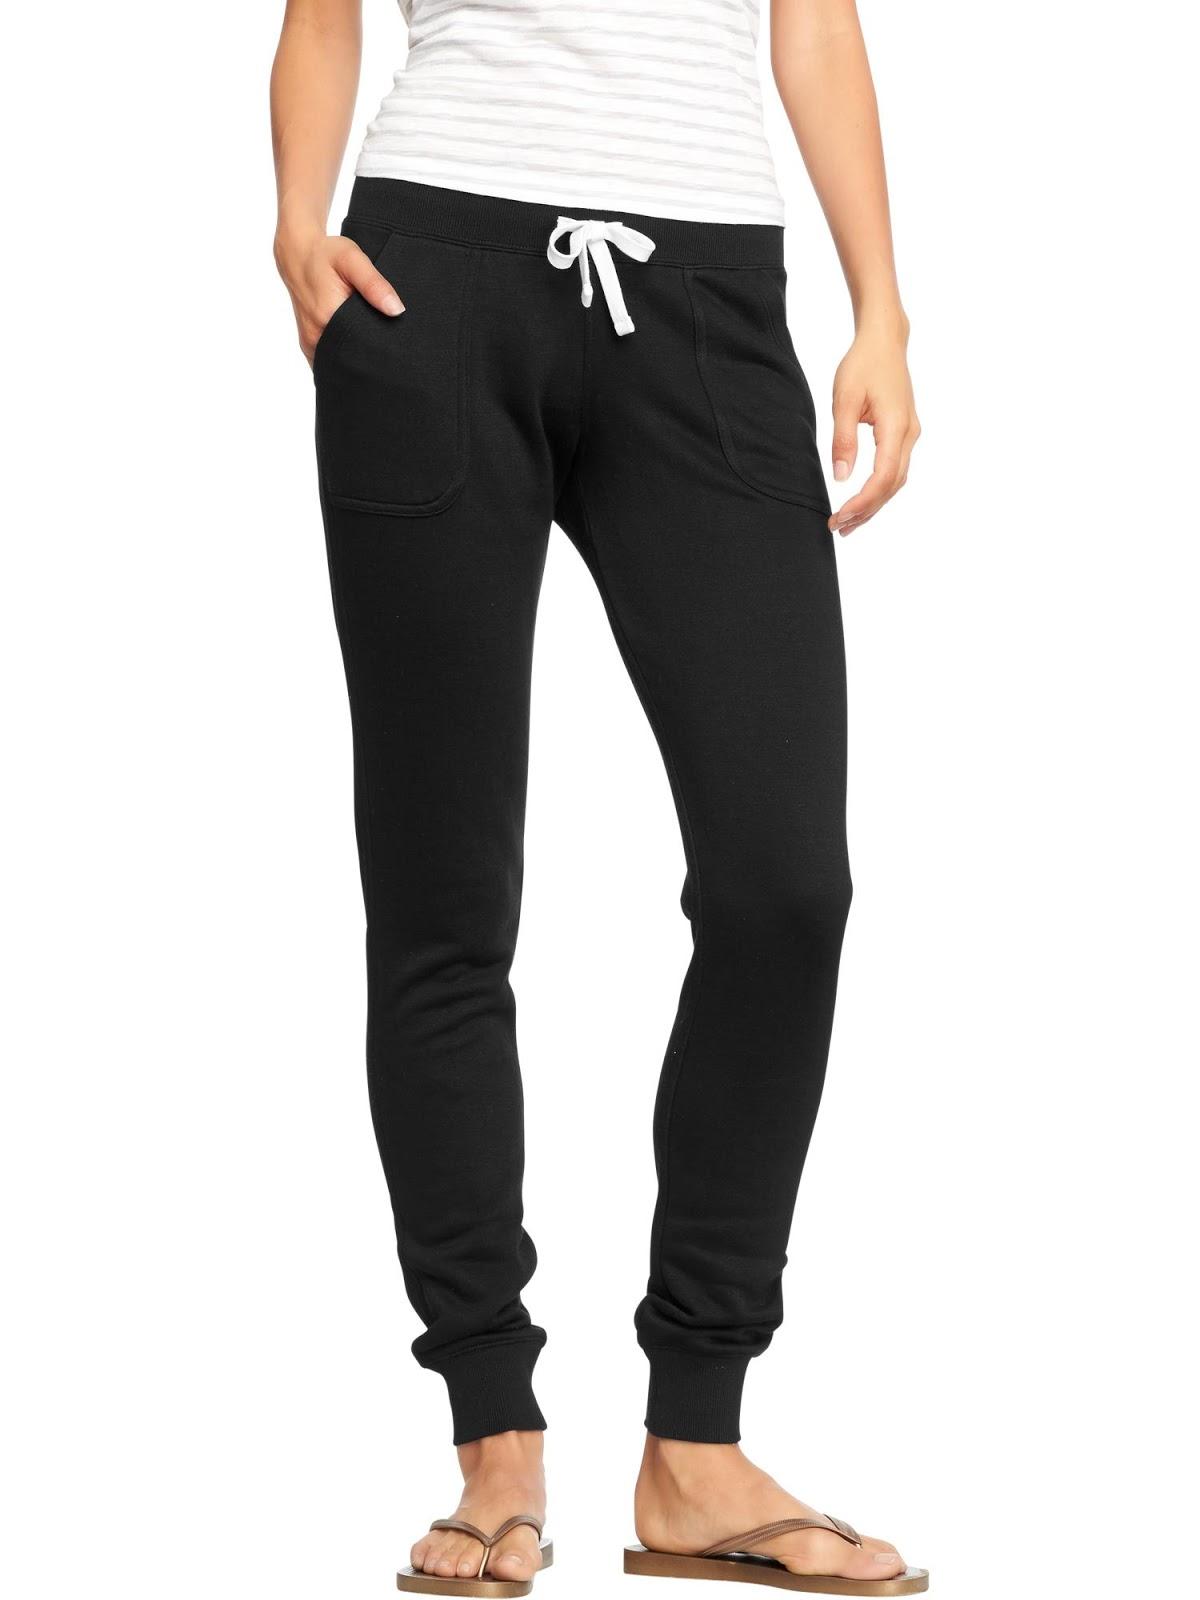 Luxury Womensamp Juniors Skinny Joggers Drawstring Sweatpants Gym Sports Pants